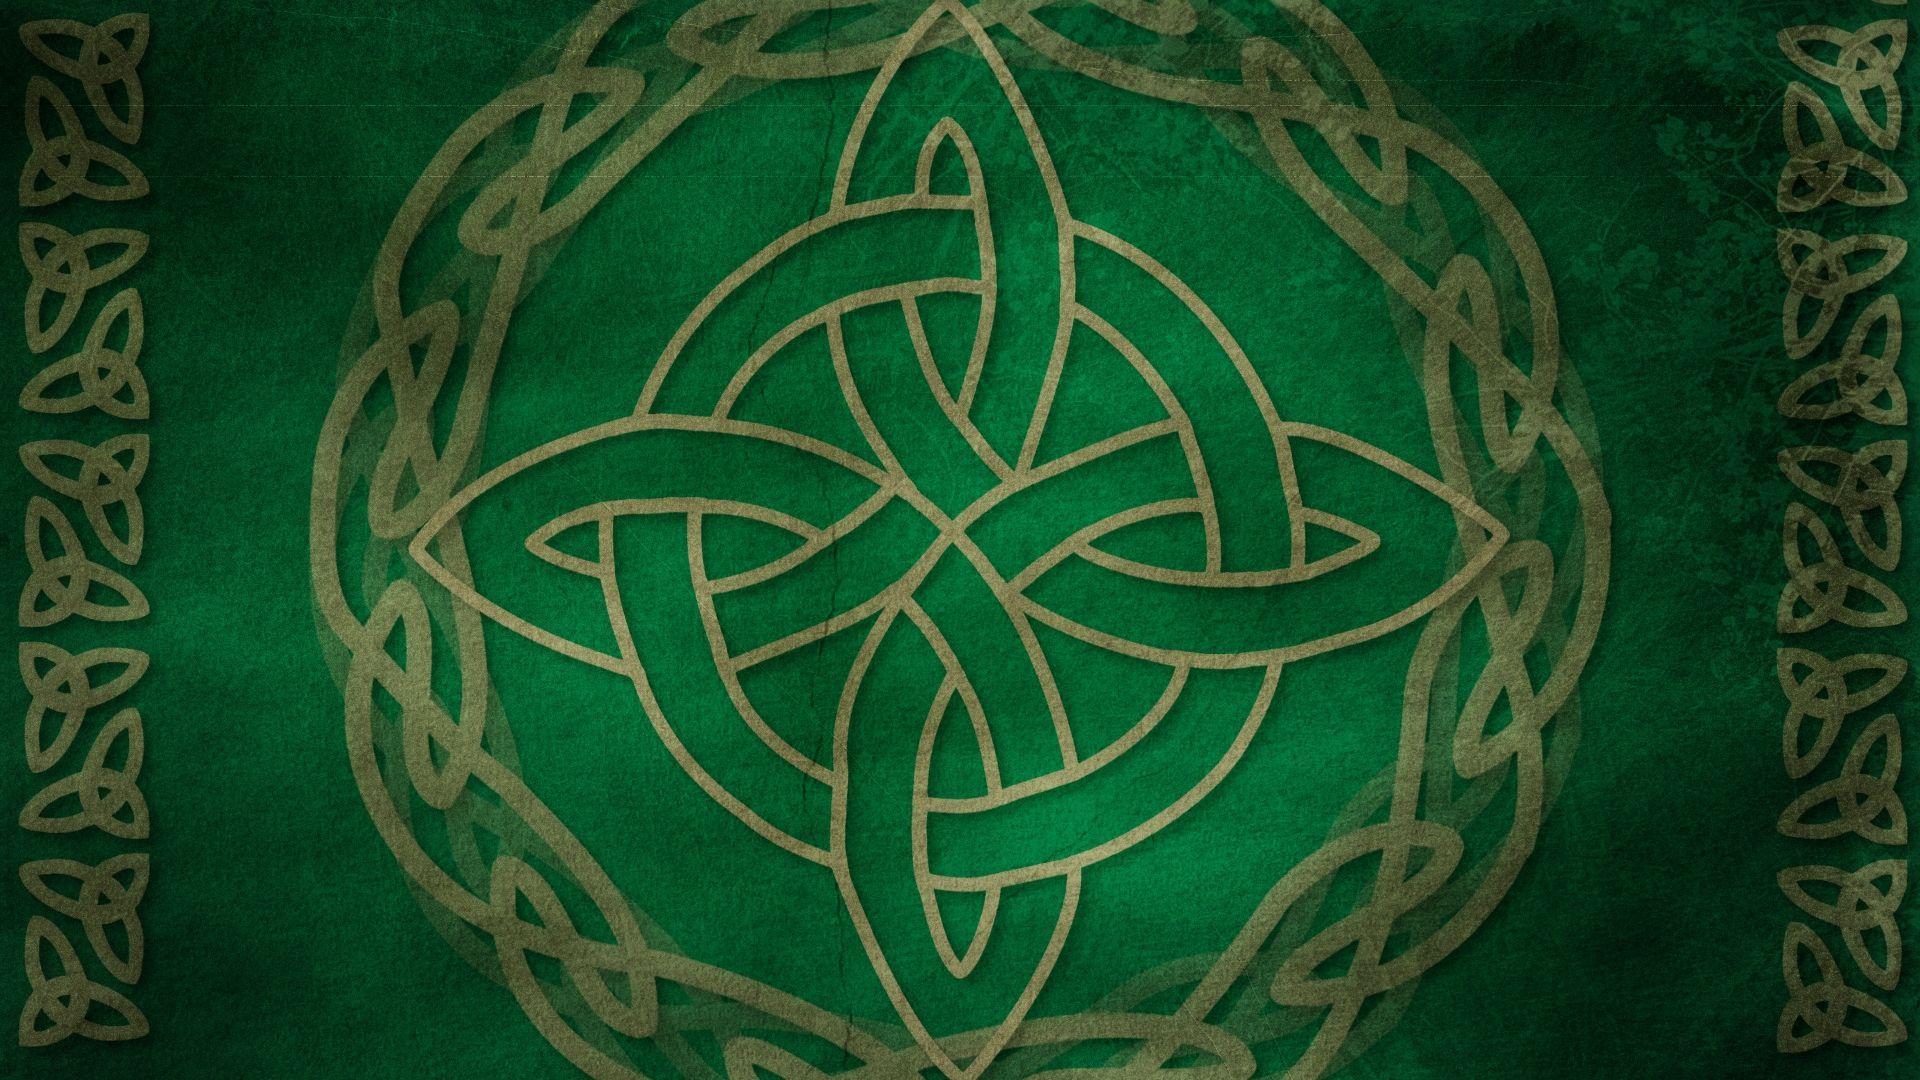 Celtic Irish Wallpapers   Top Celtic Irish Backgrounds 1920x1080